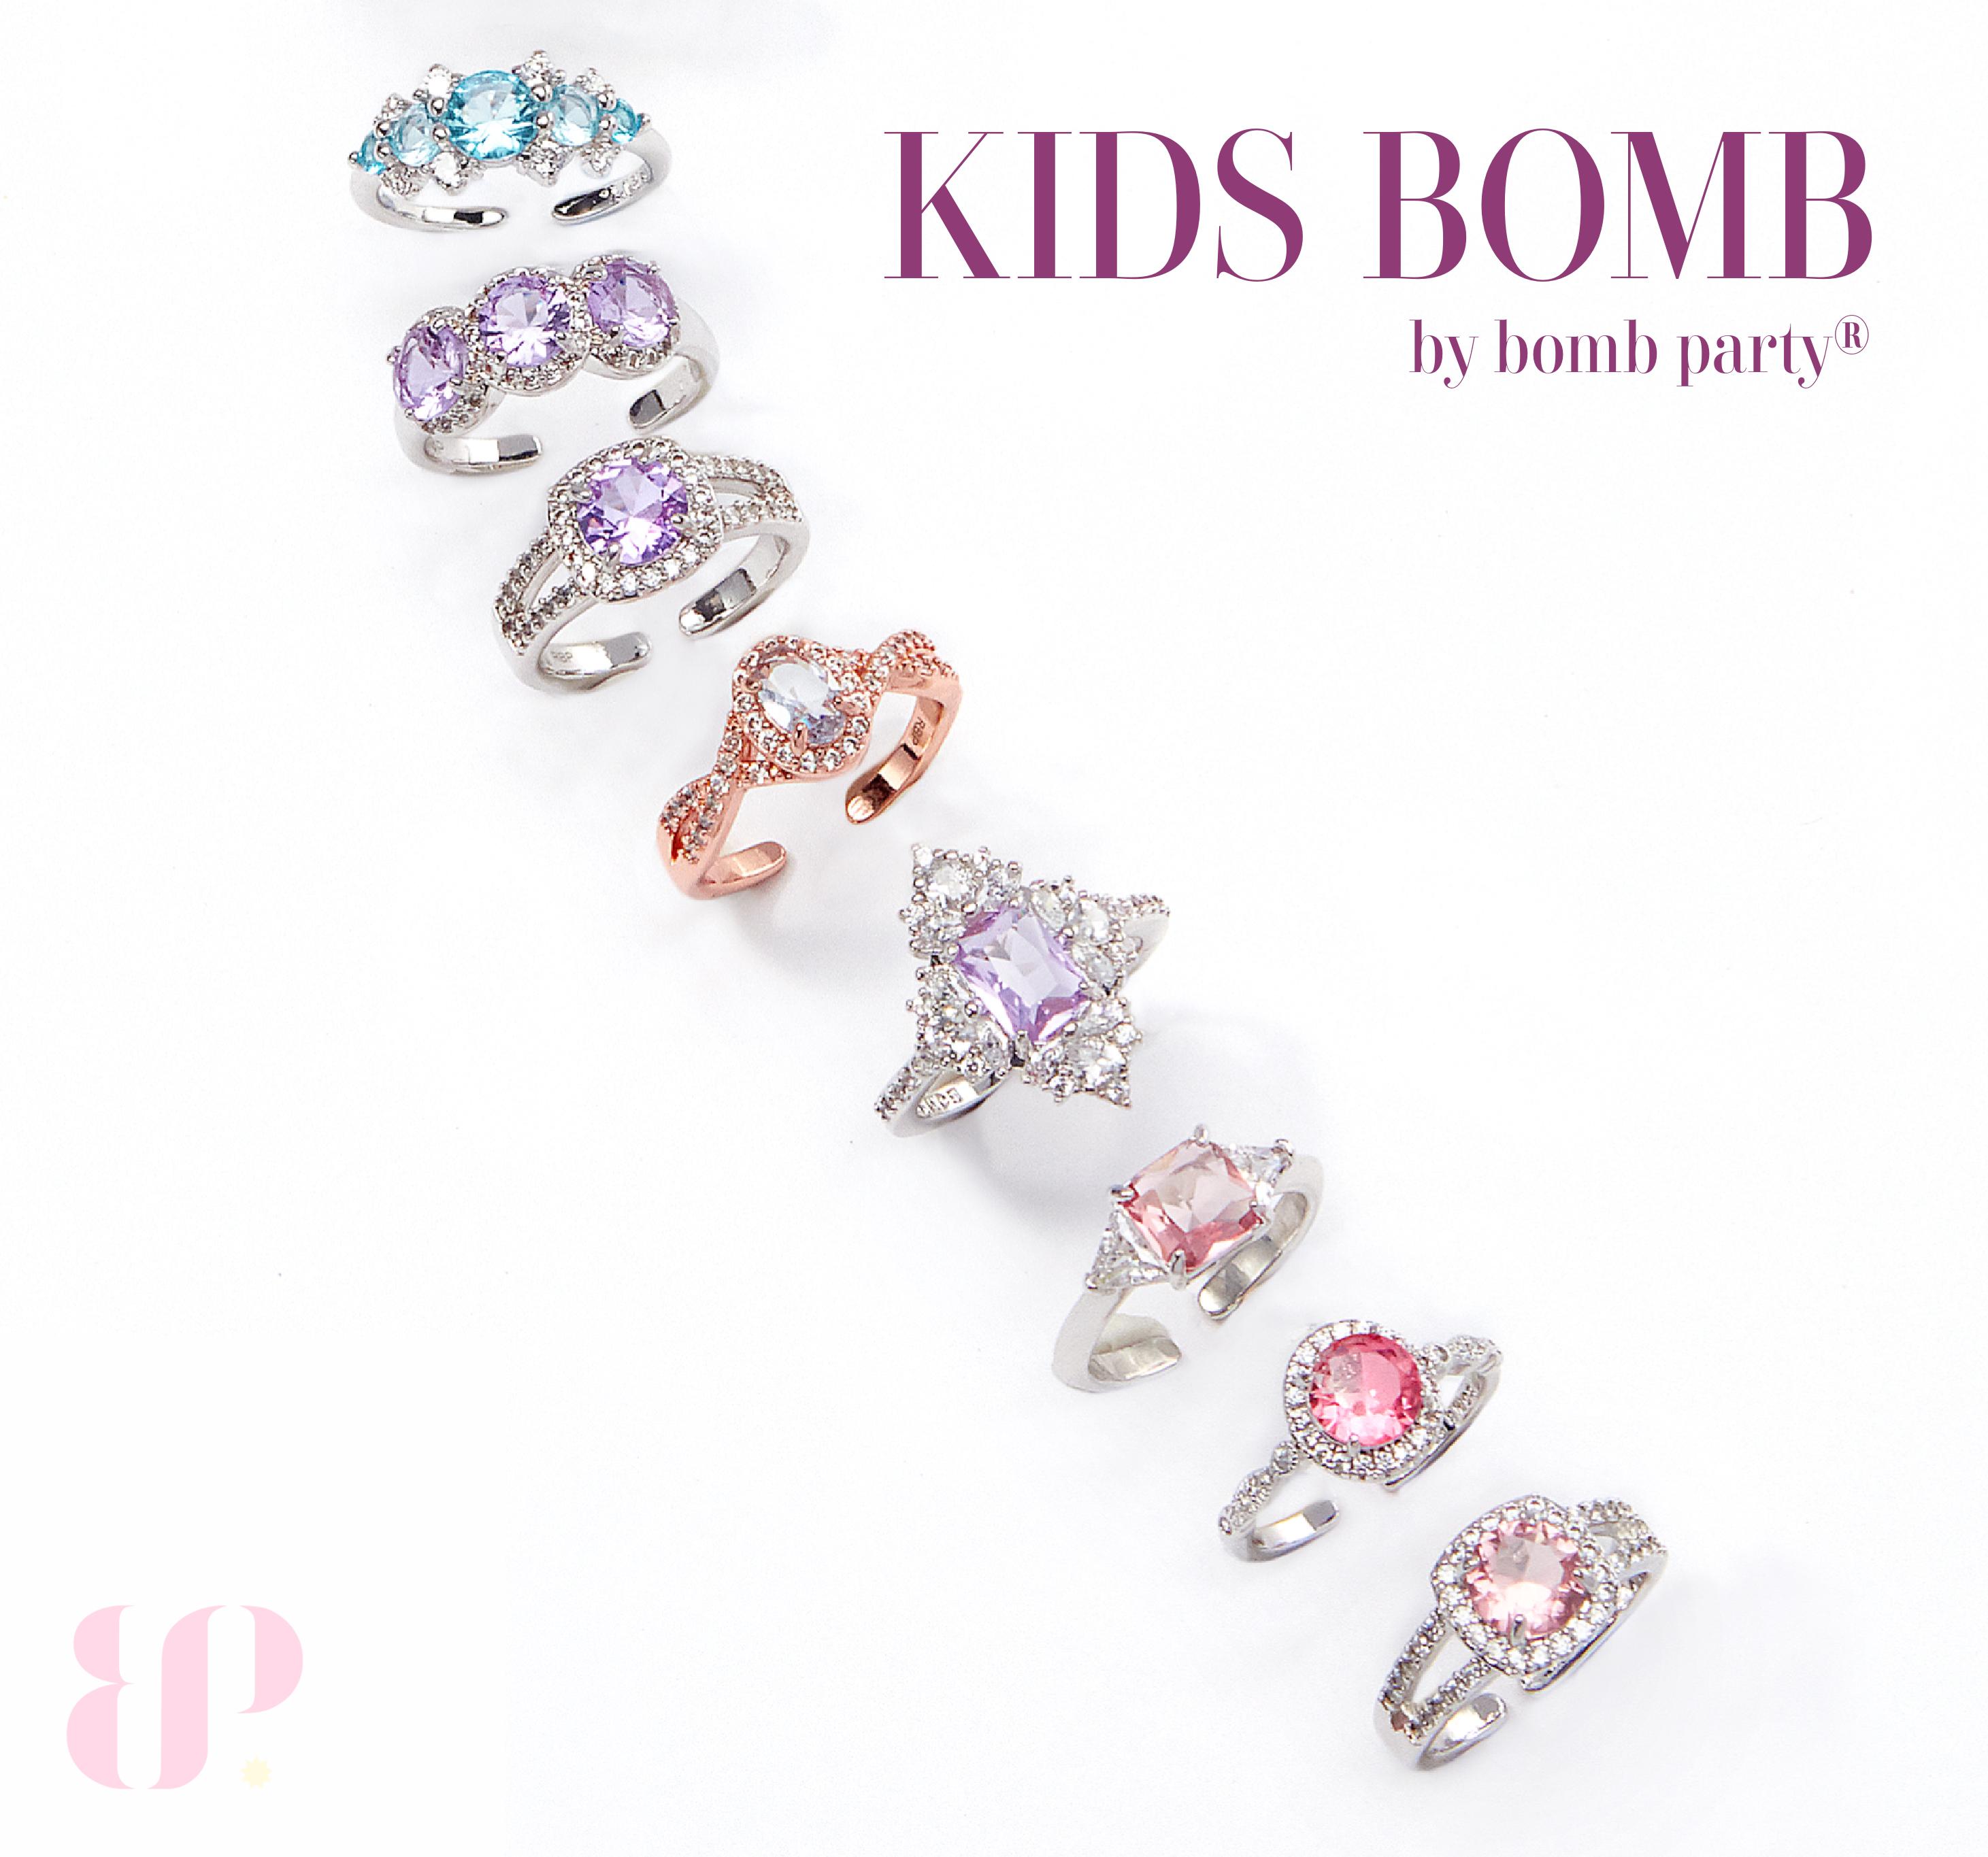 Image for Kids Bomb